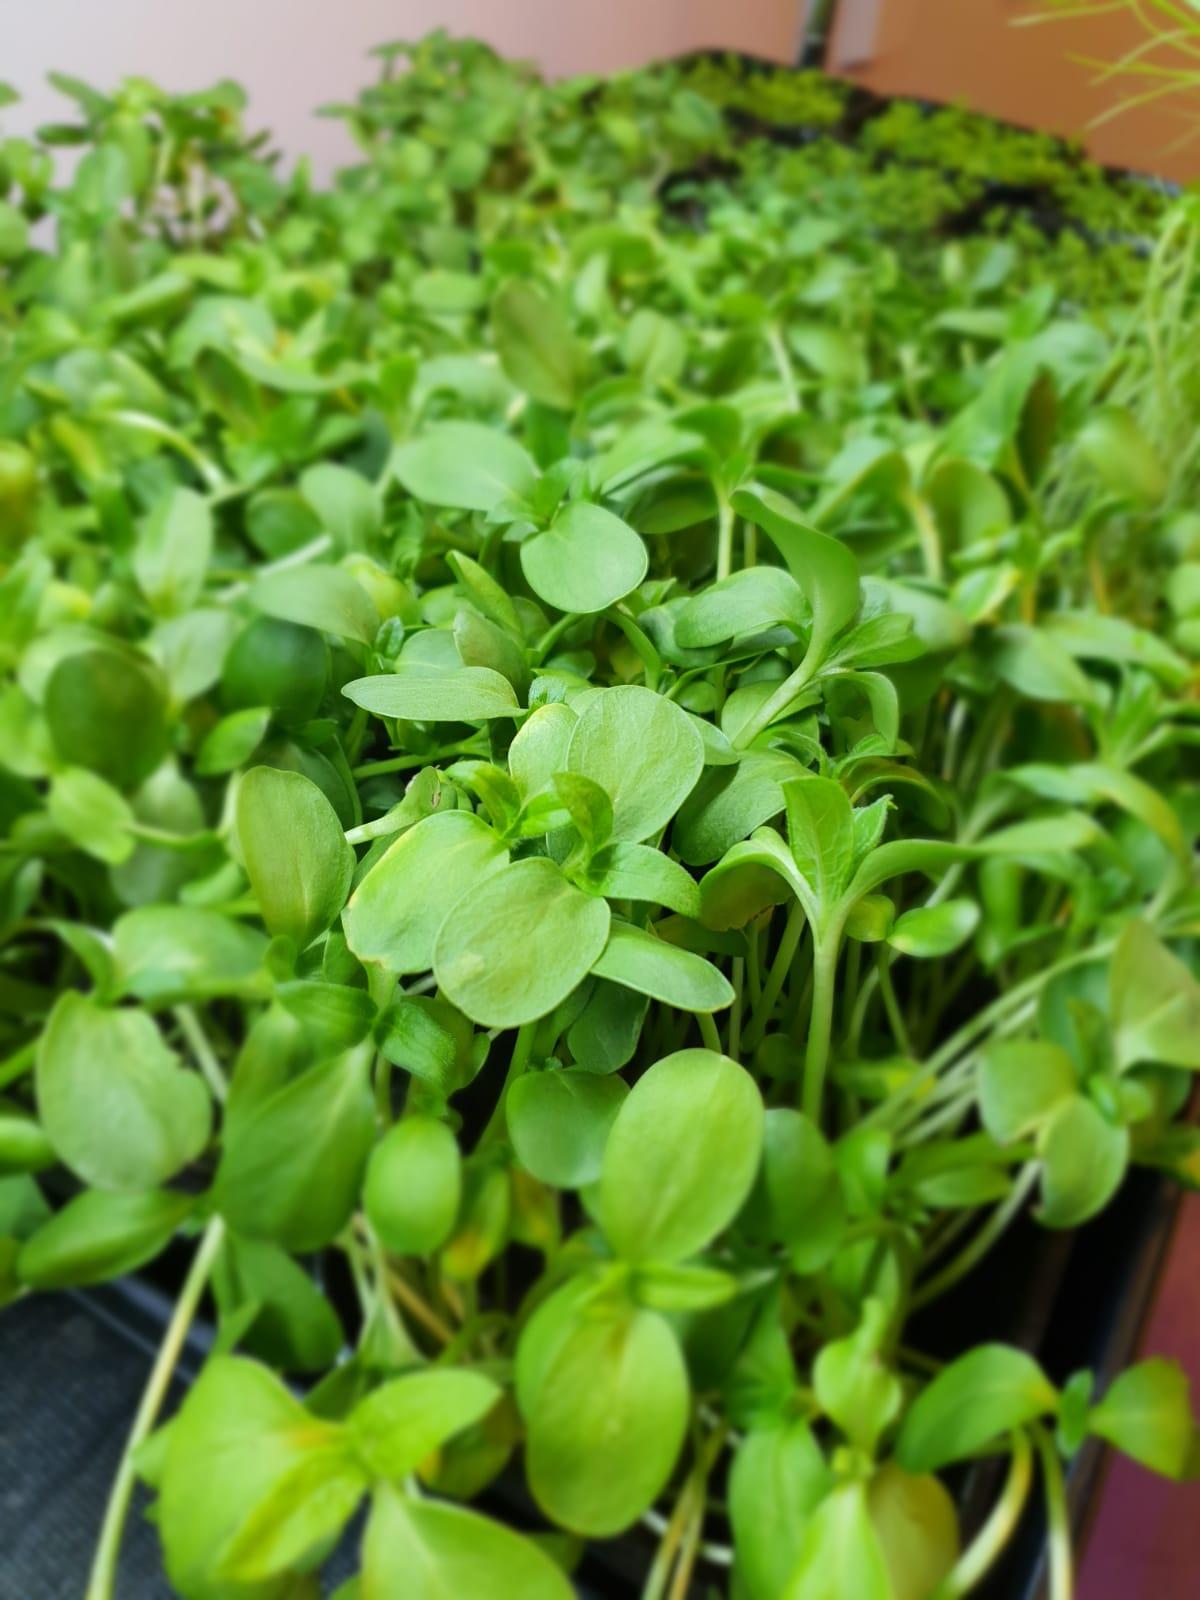 Sunflower microgreens